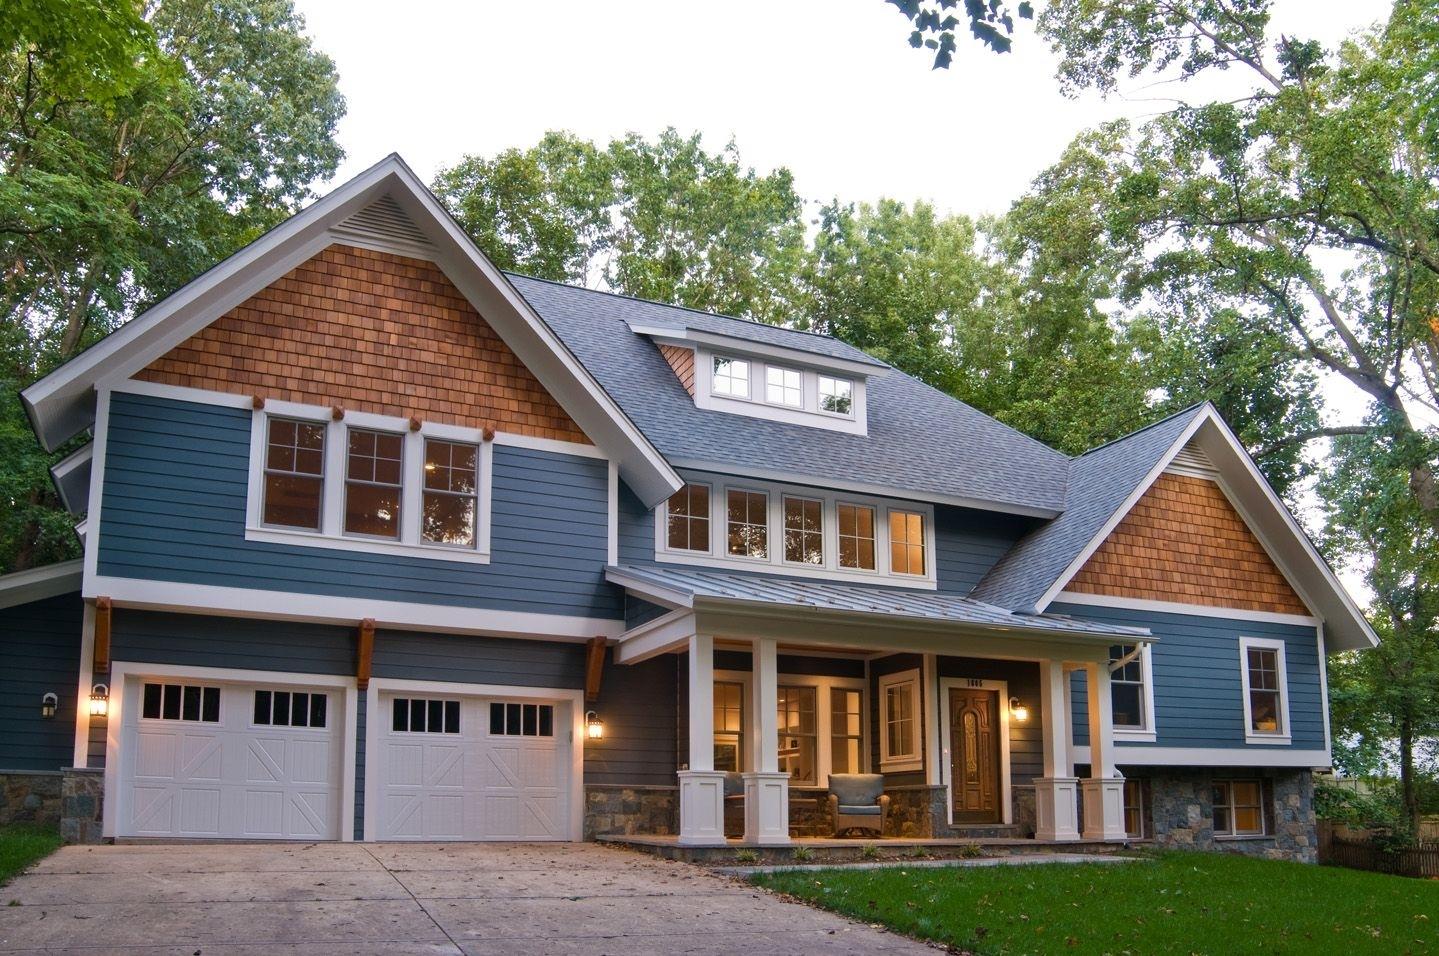 Split Level House Siding Ideas - Madison Art Center Design on House Siding Ideas  id=45257